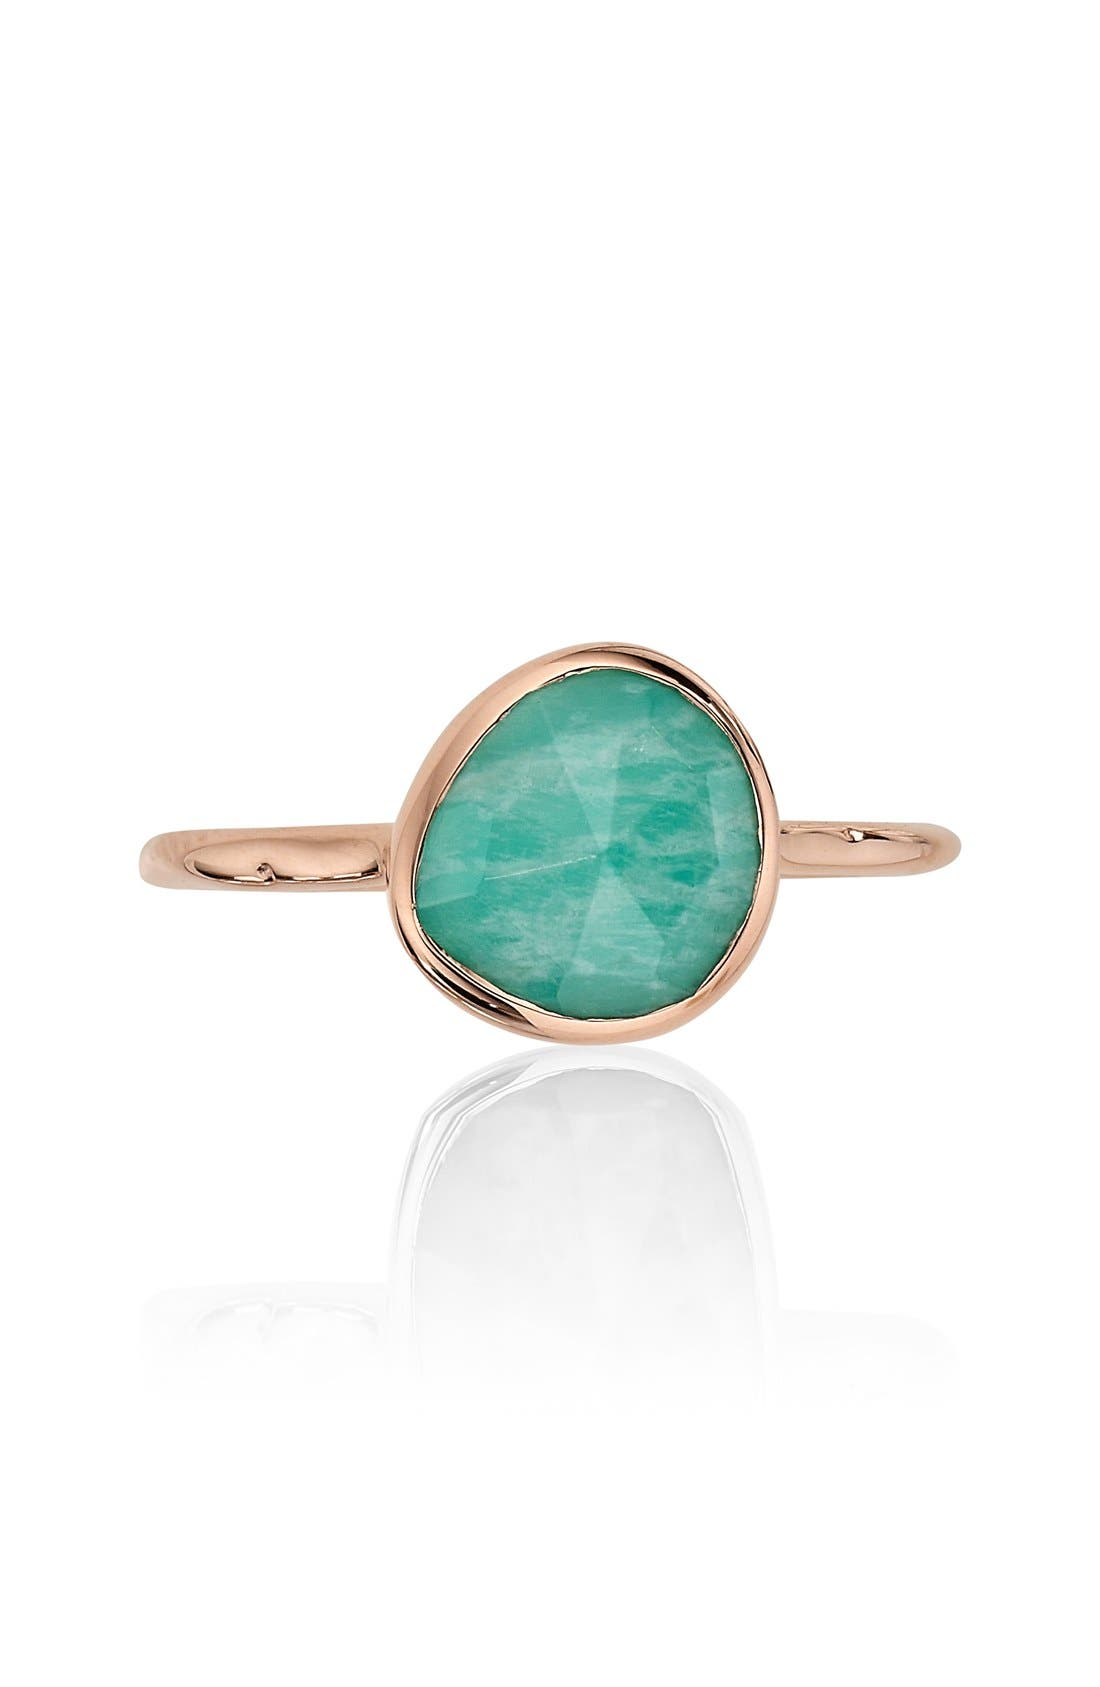 Siren Semiprecious Stone Stacking Ring,                             Alternate thumbnail 3, color,                             Rose Gold/ Amazonite